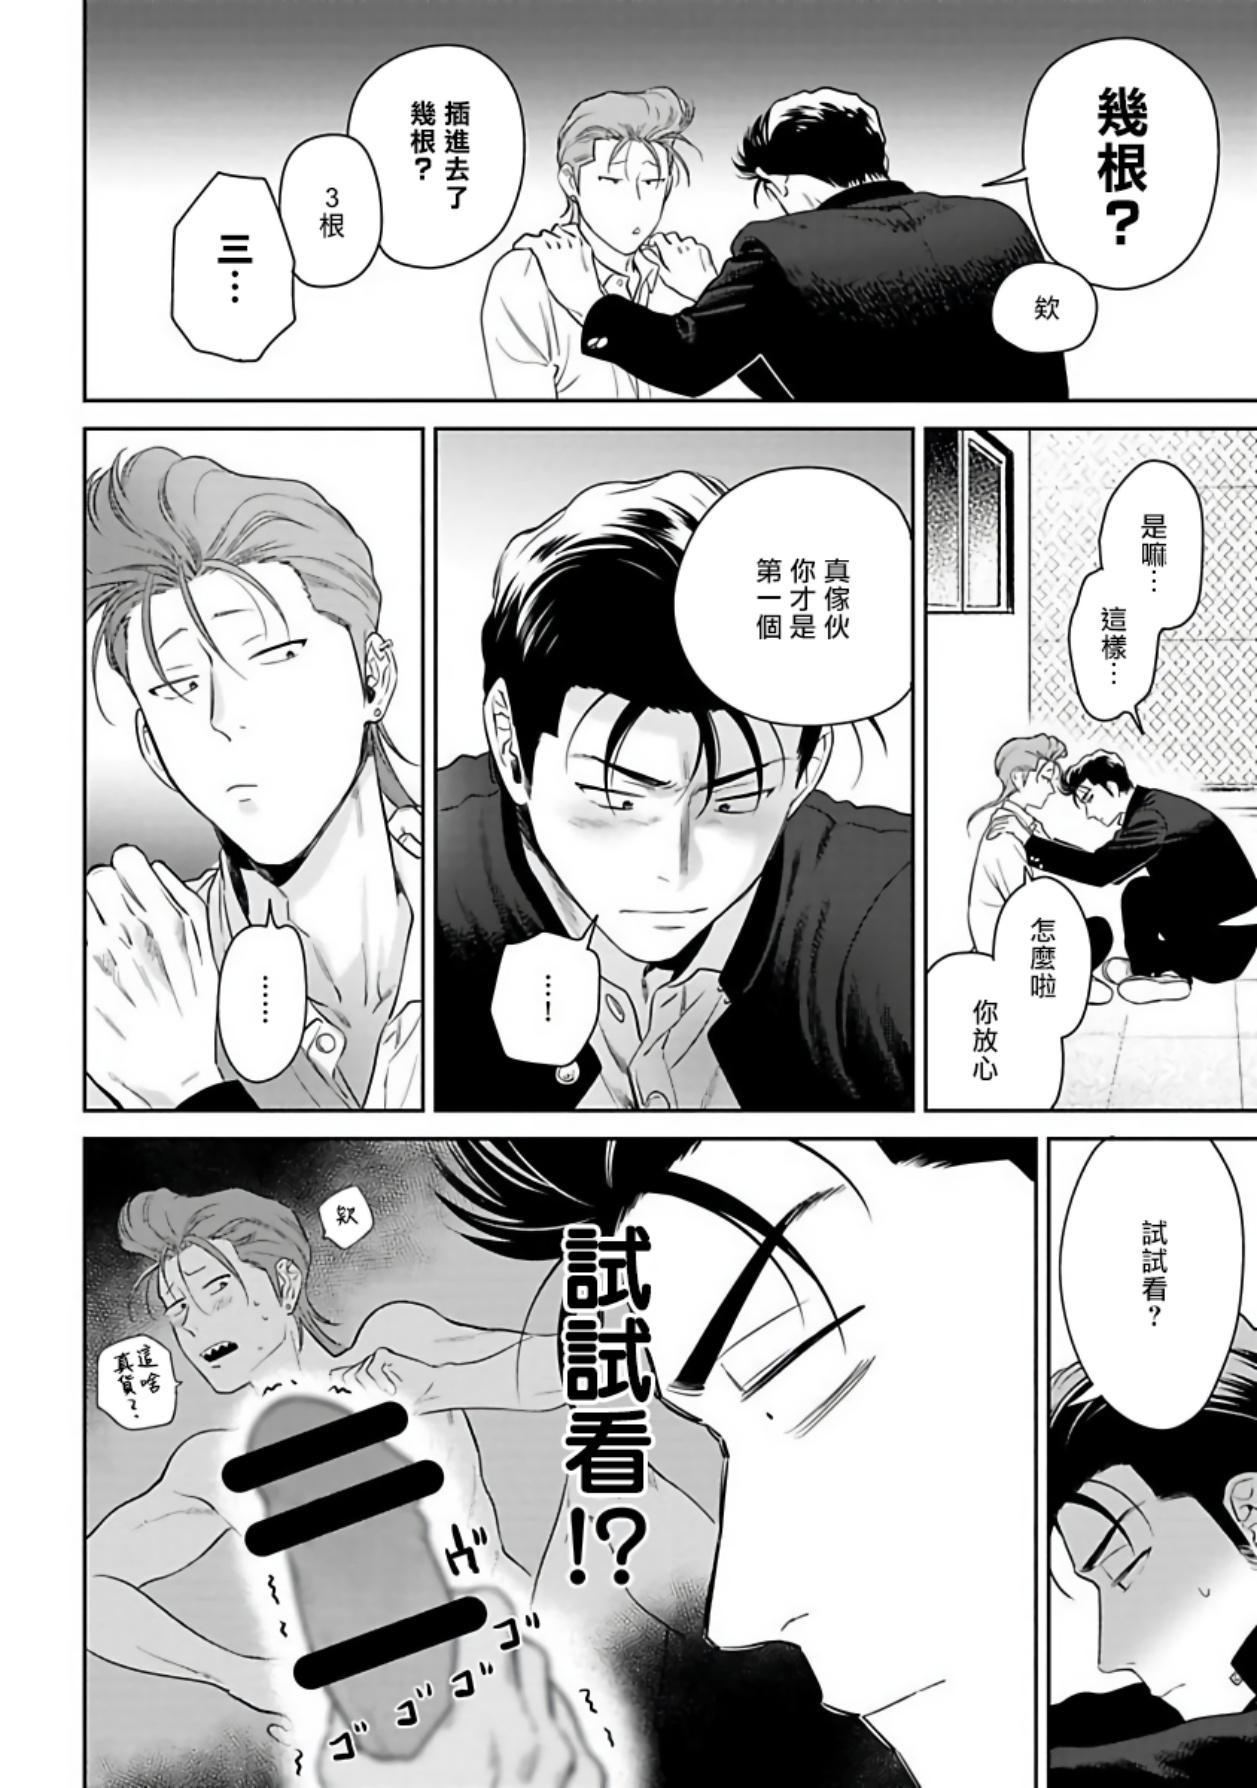 Nakasete Yaru yo Yankee-kun   让你哭噢小混混 番外 2